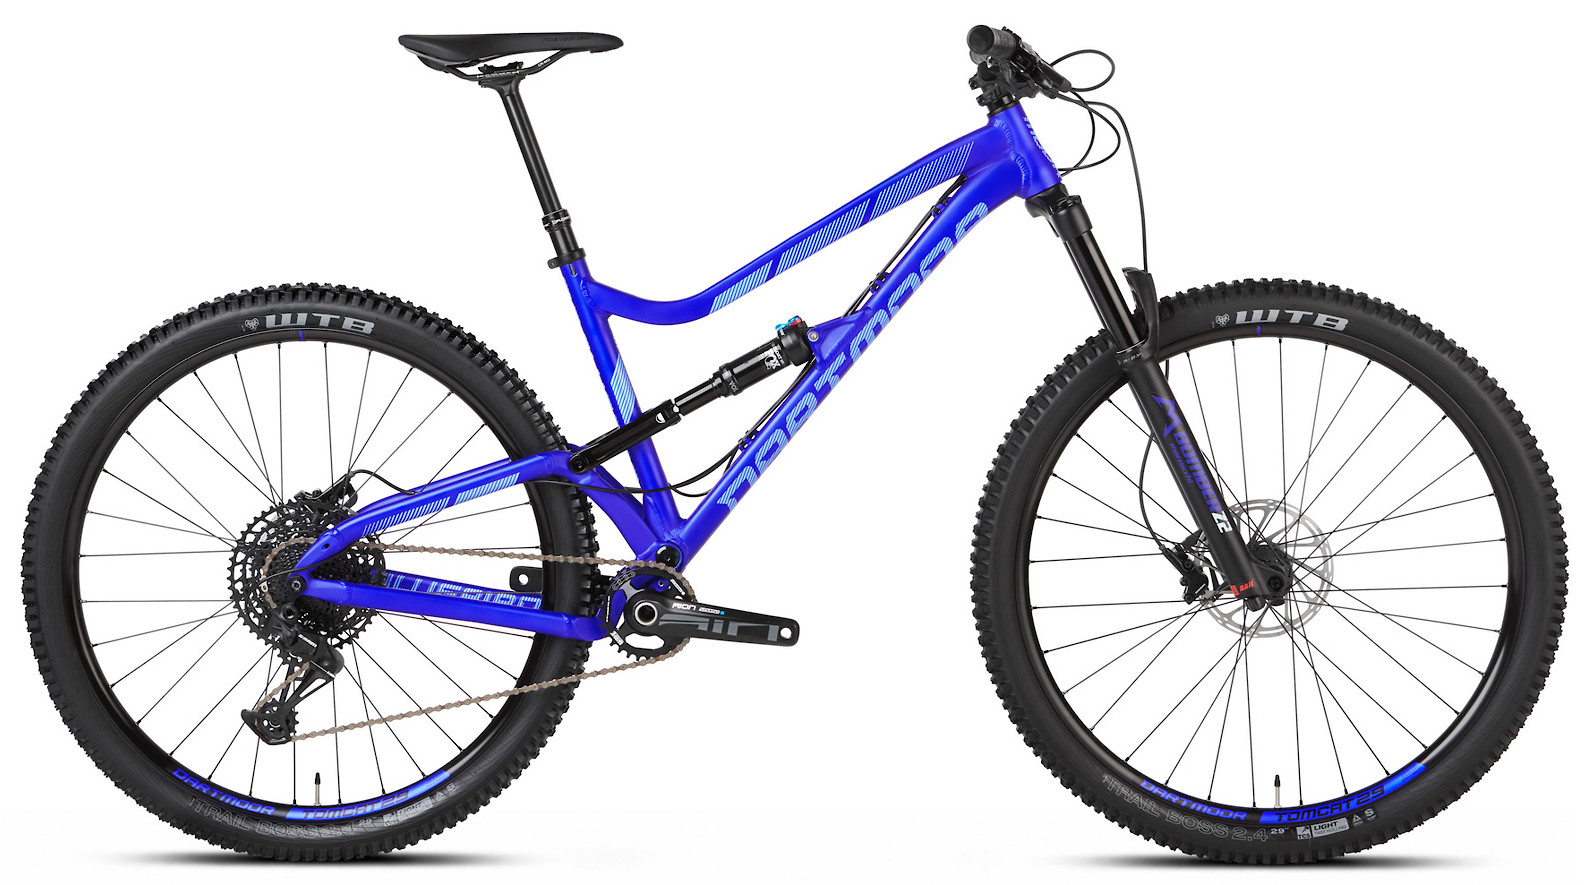 2020 Dartmoor Bluebird Pro 29